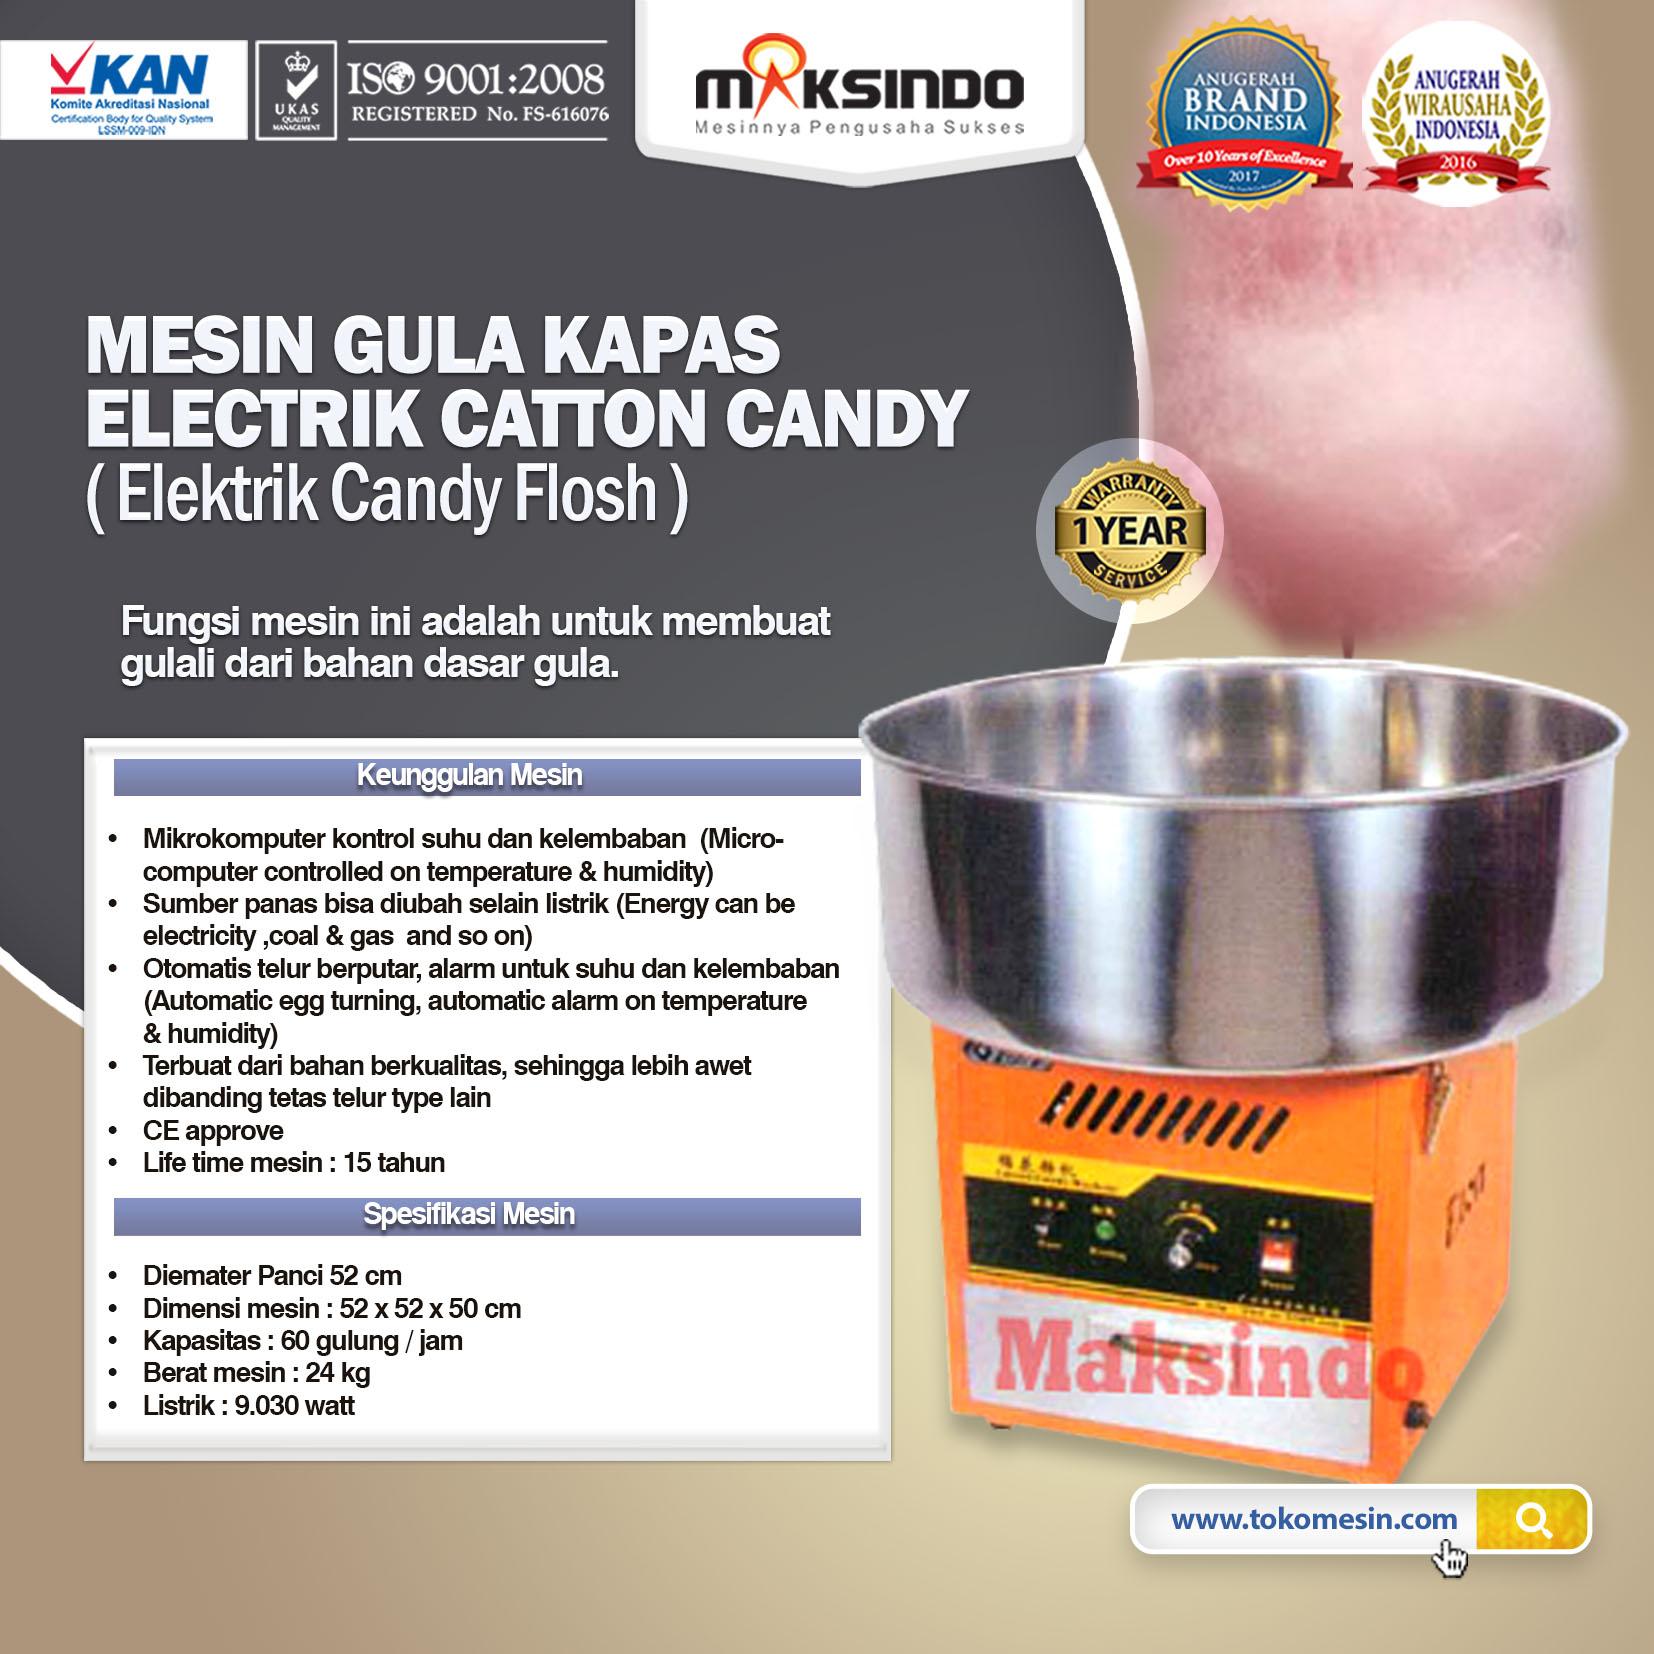 Mesin Gula Kapas Baru (Cotton Candy)